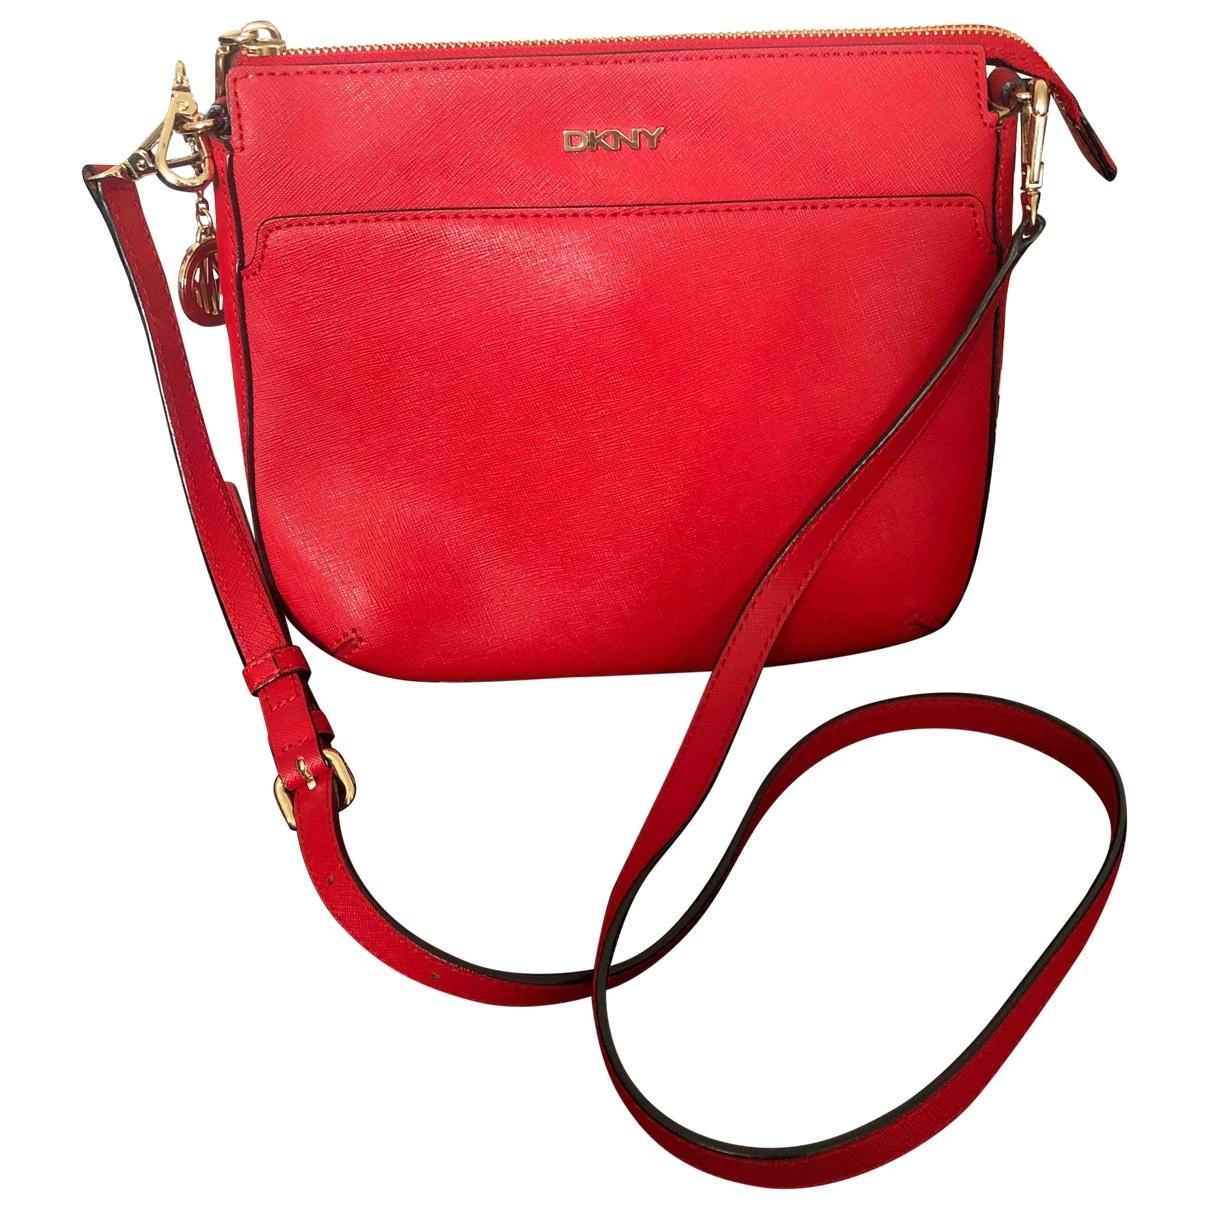 Dkny \N Red Leather handbag for Women \N